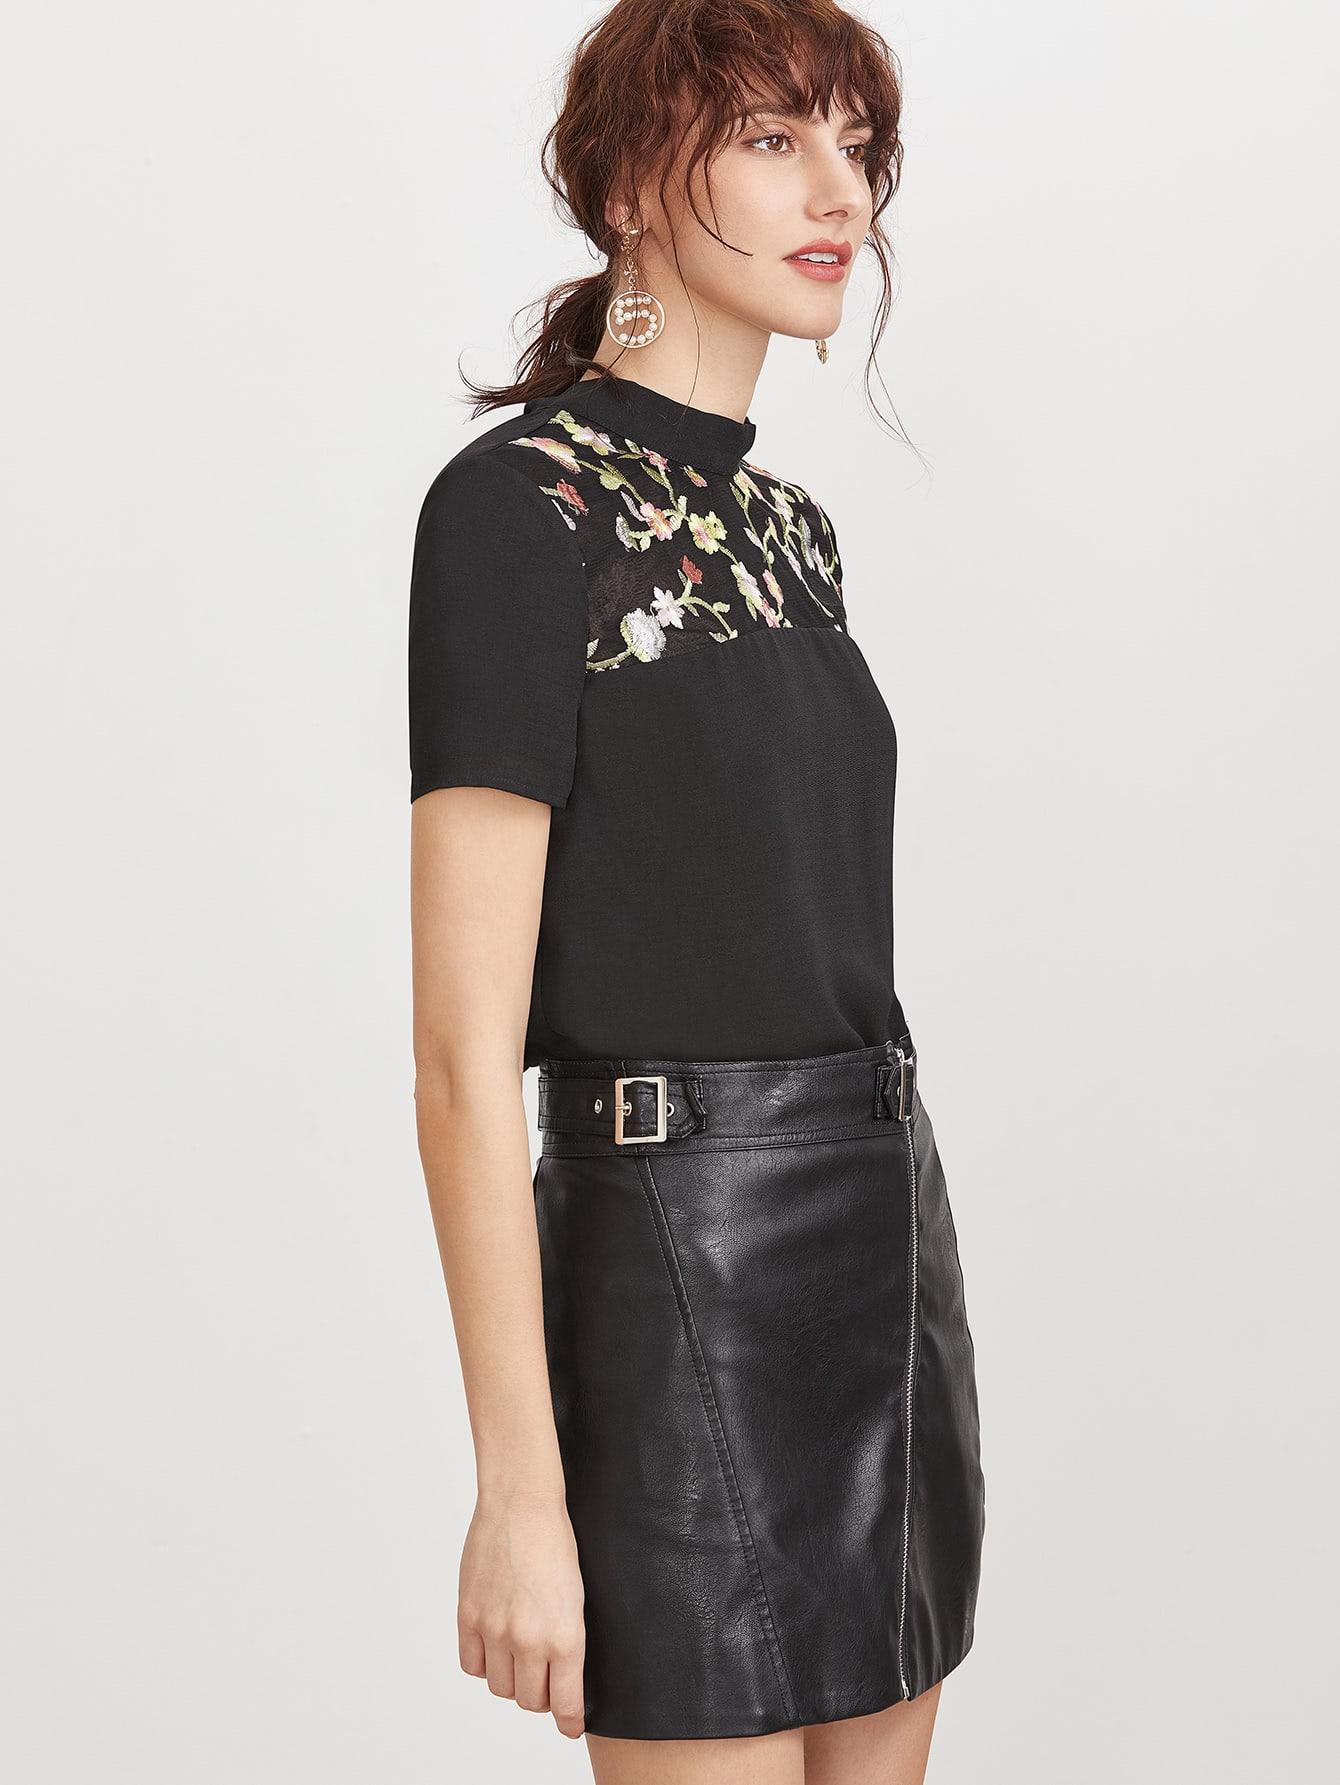 blouse161227713_2